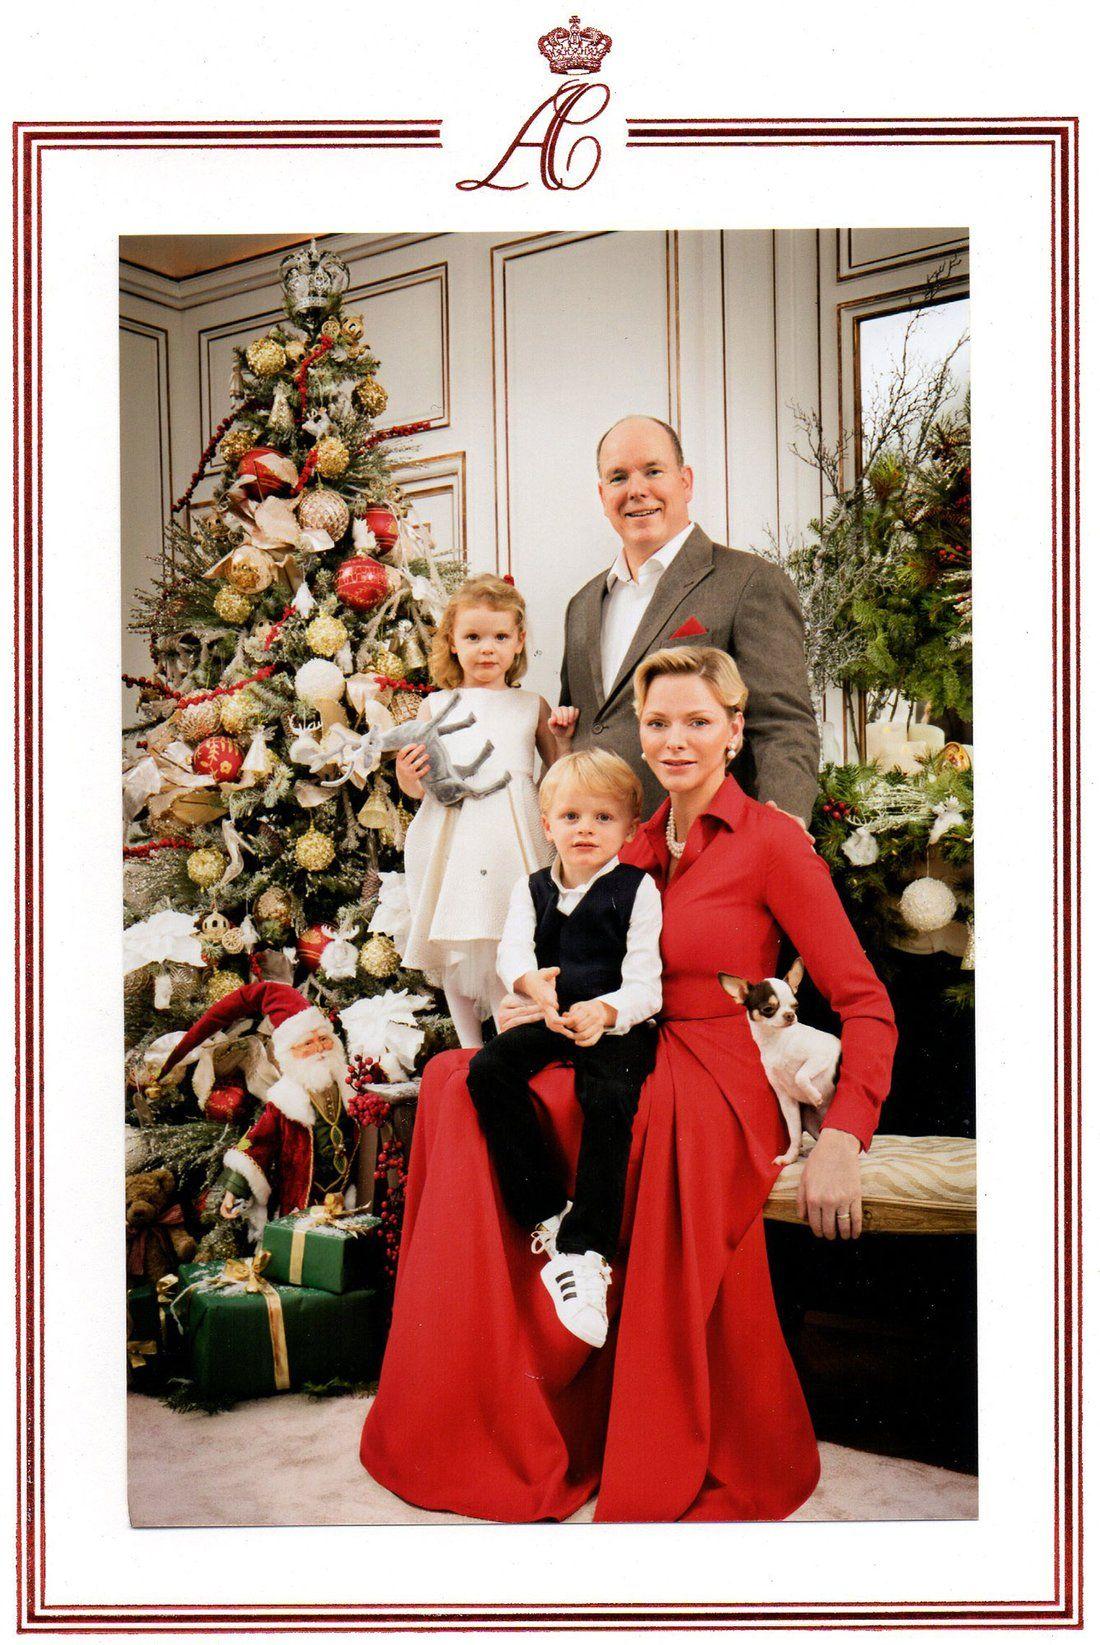 Royal Twins Princess Gabriella And Prince Jacques Shine In New